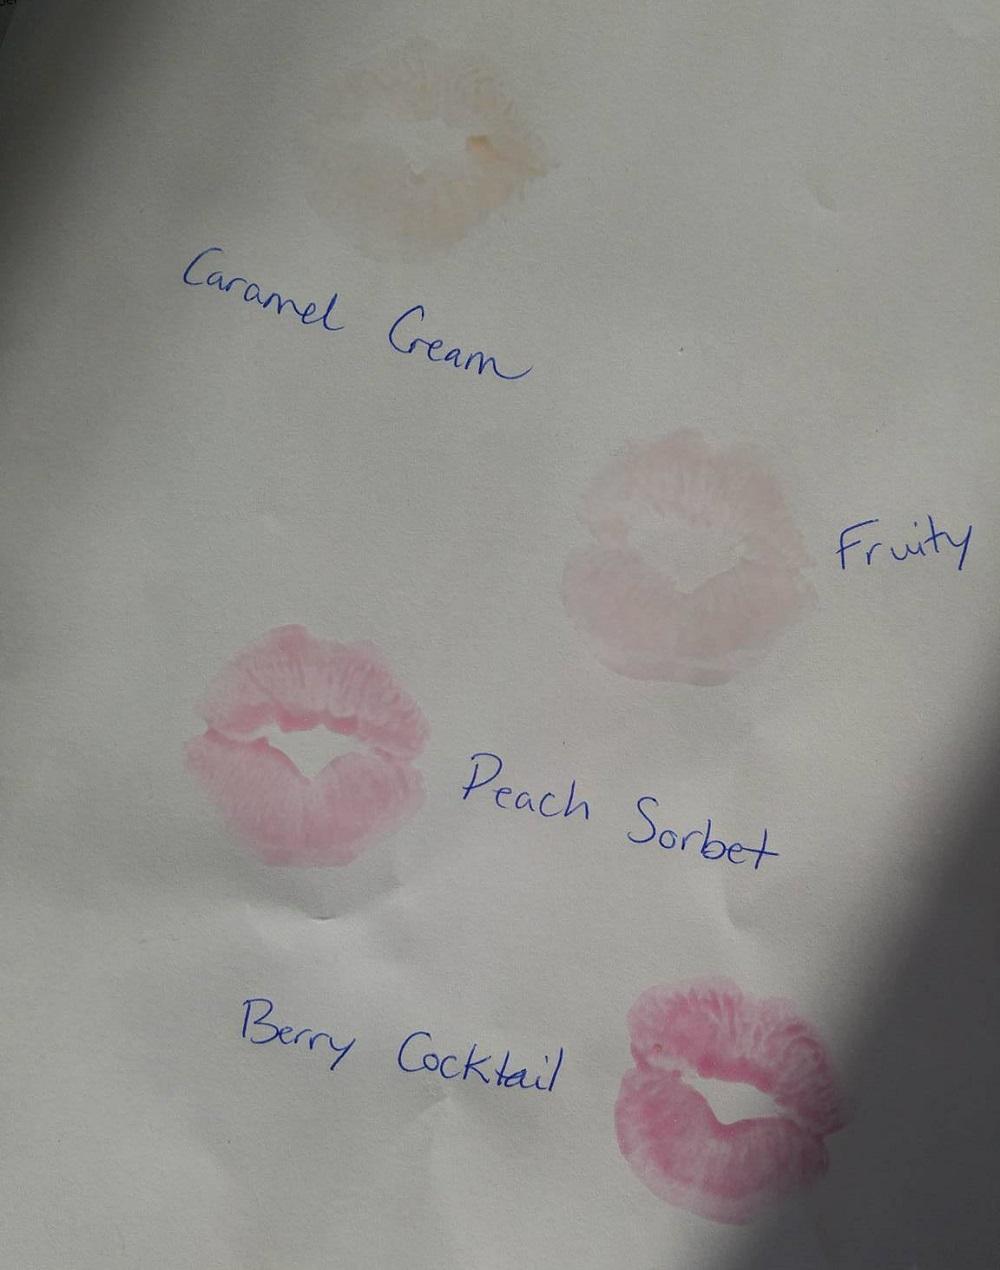 Cien Ultra Shiny Lipgloss, Cien scented lipgloss, Cien, Cien makeup, cien nail polish, affordable makeup, cheap makeup, cien maquillage, cien lidl, cien produits, Lidl, great makeup, sleek makeup, non sticky lipgloss, lipstick, Cien cosmetics, discount makeup, makeup on sale